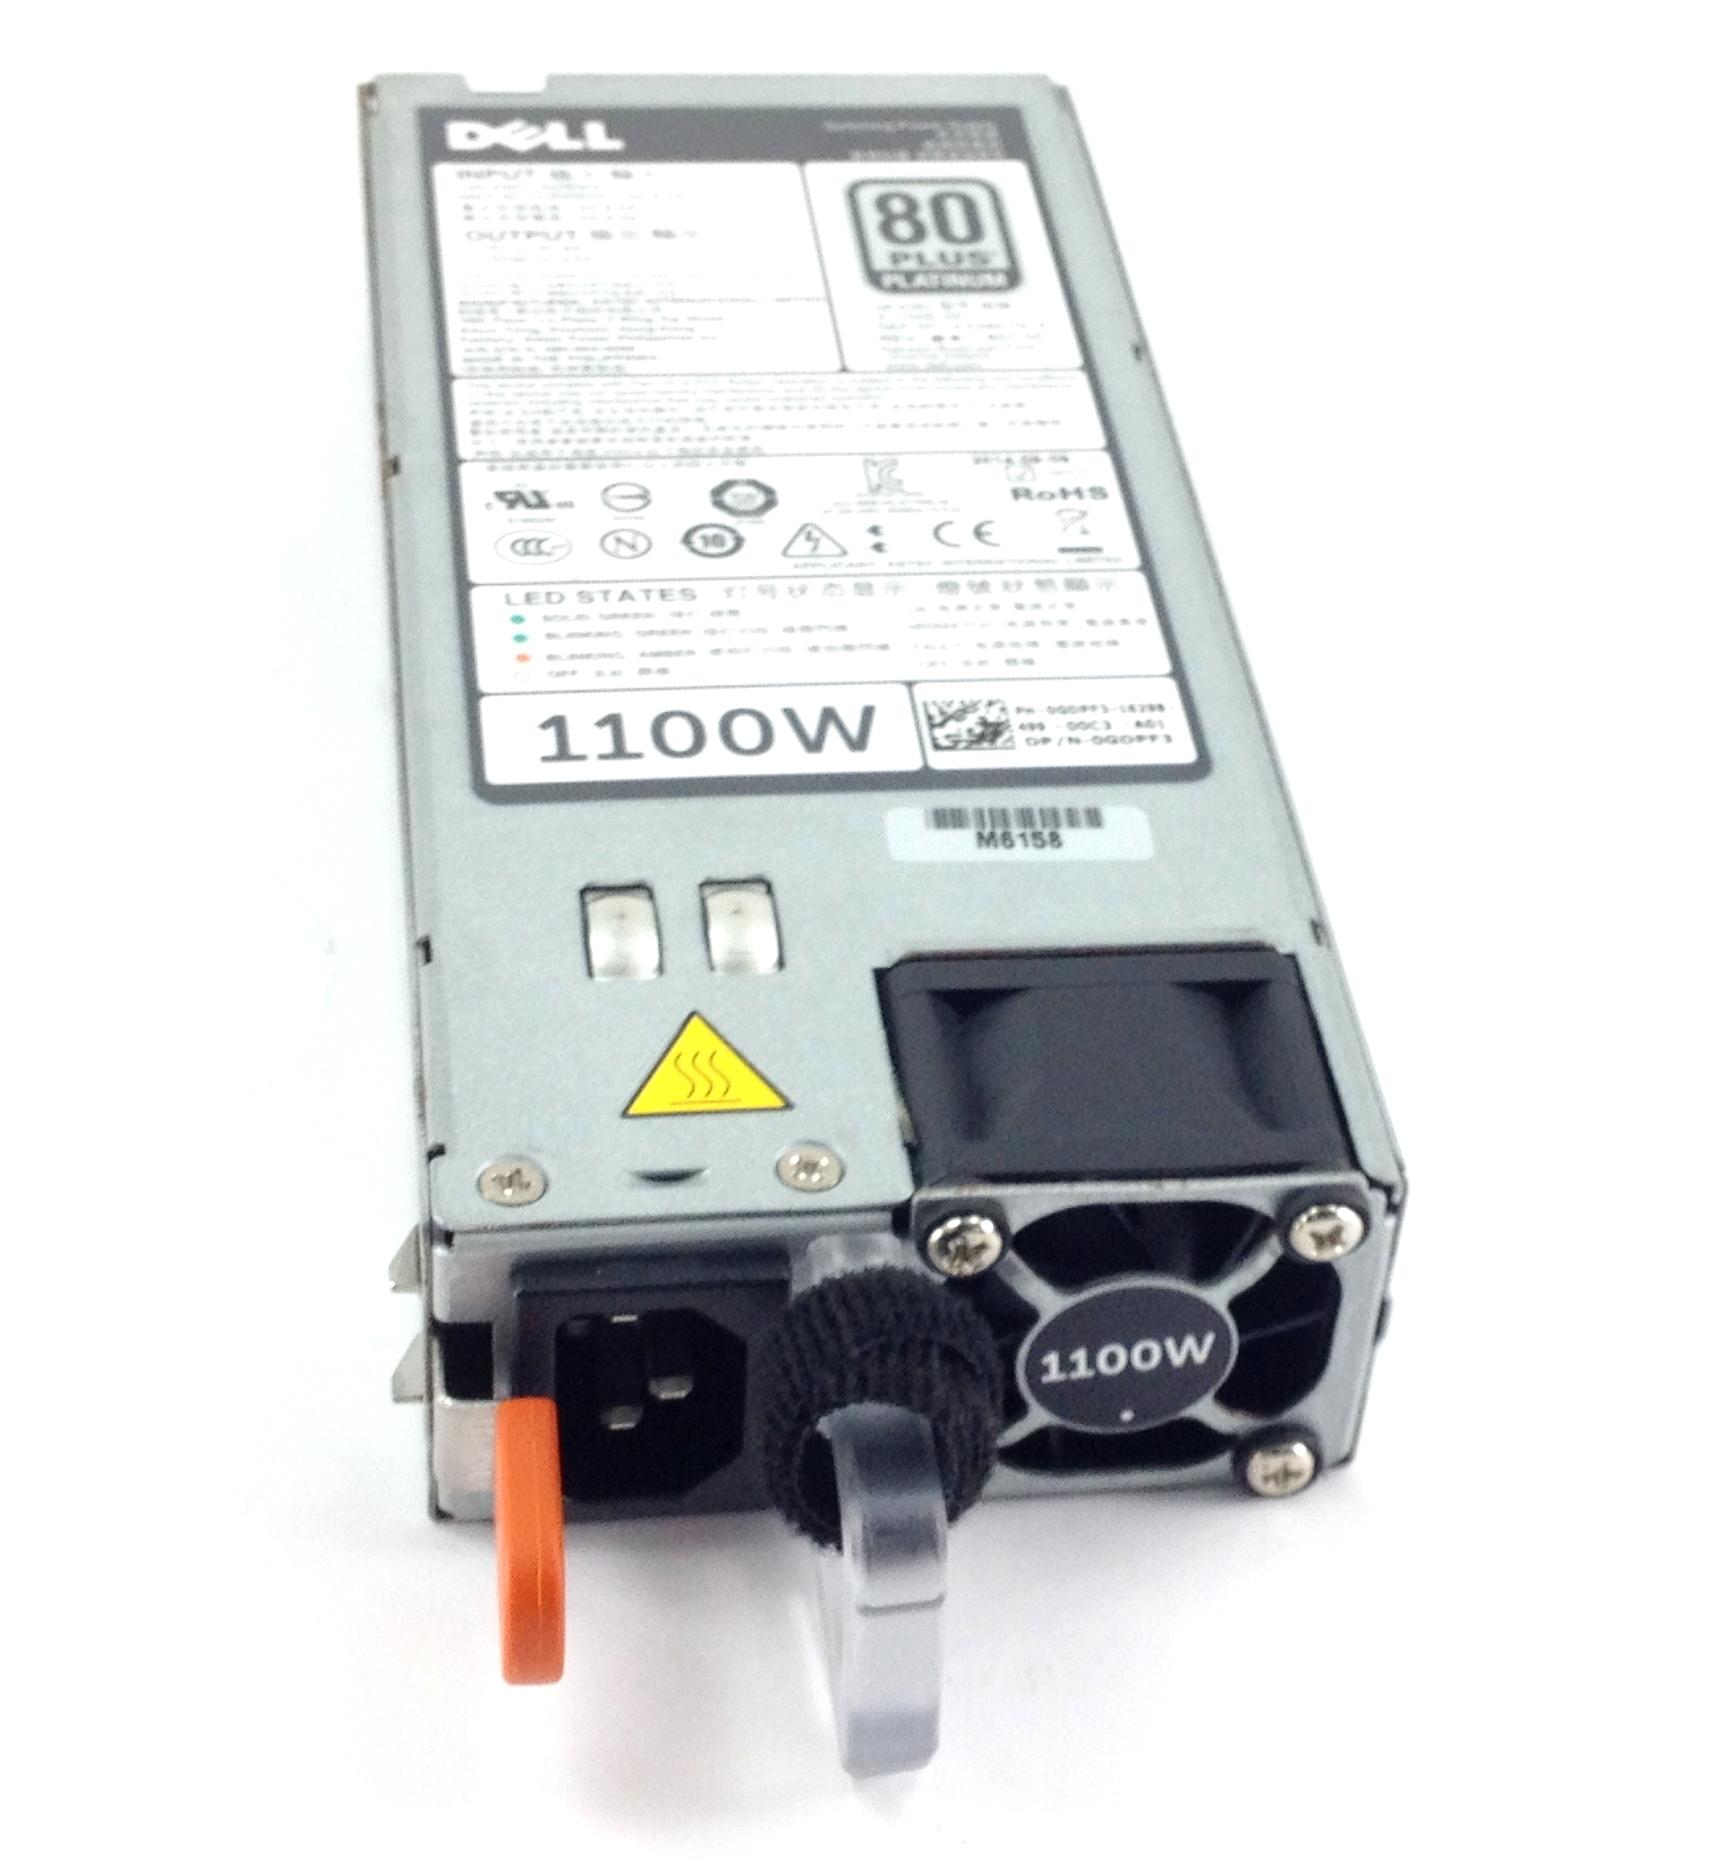 FOR DELL POWEREDGE R520//R620//R720//R720XD GDPF3 1100W REDUNDANT POWER SUPPLY